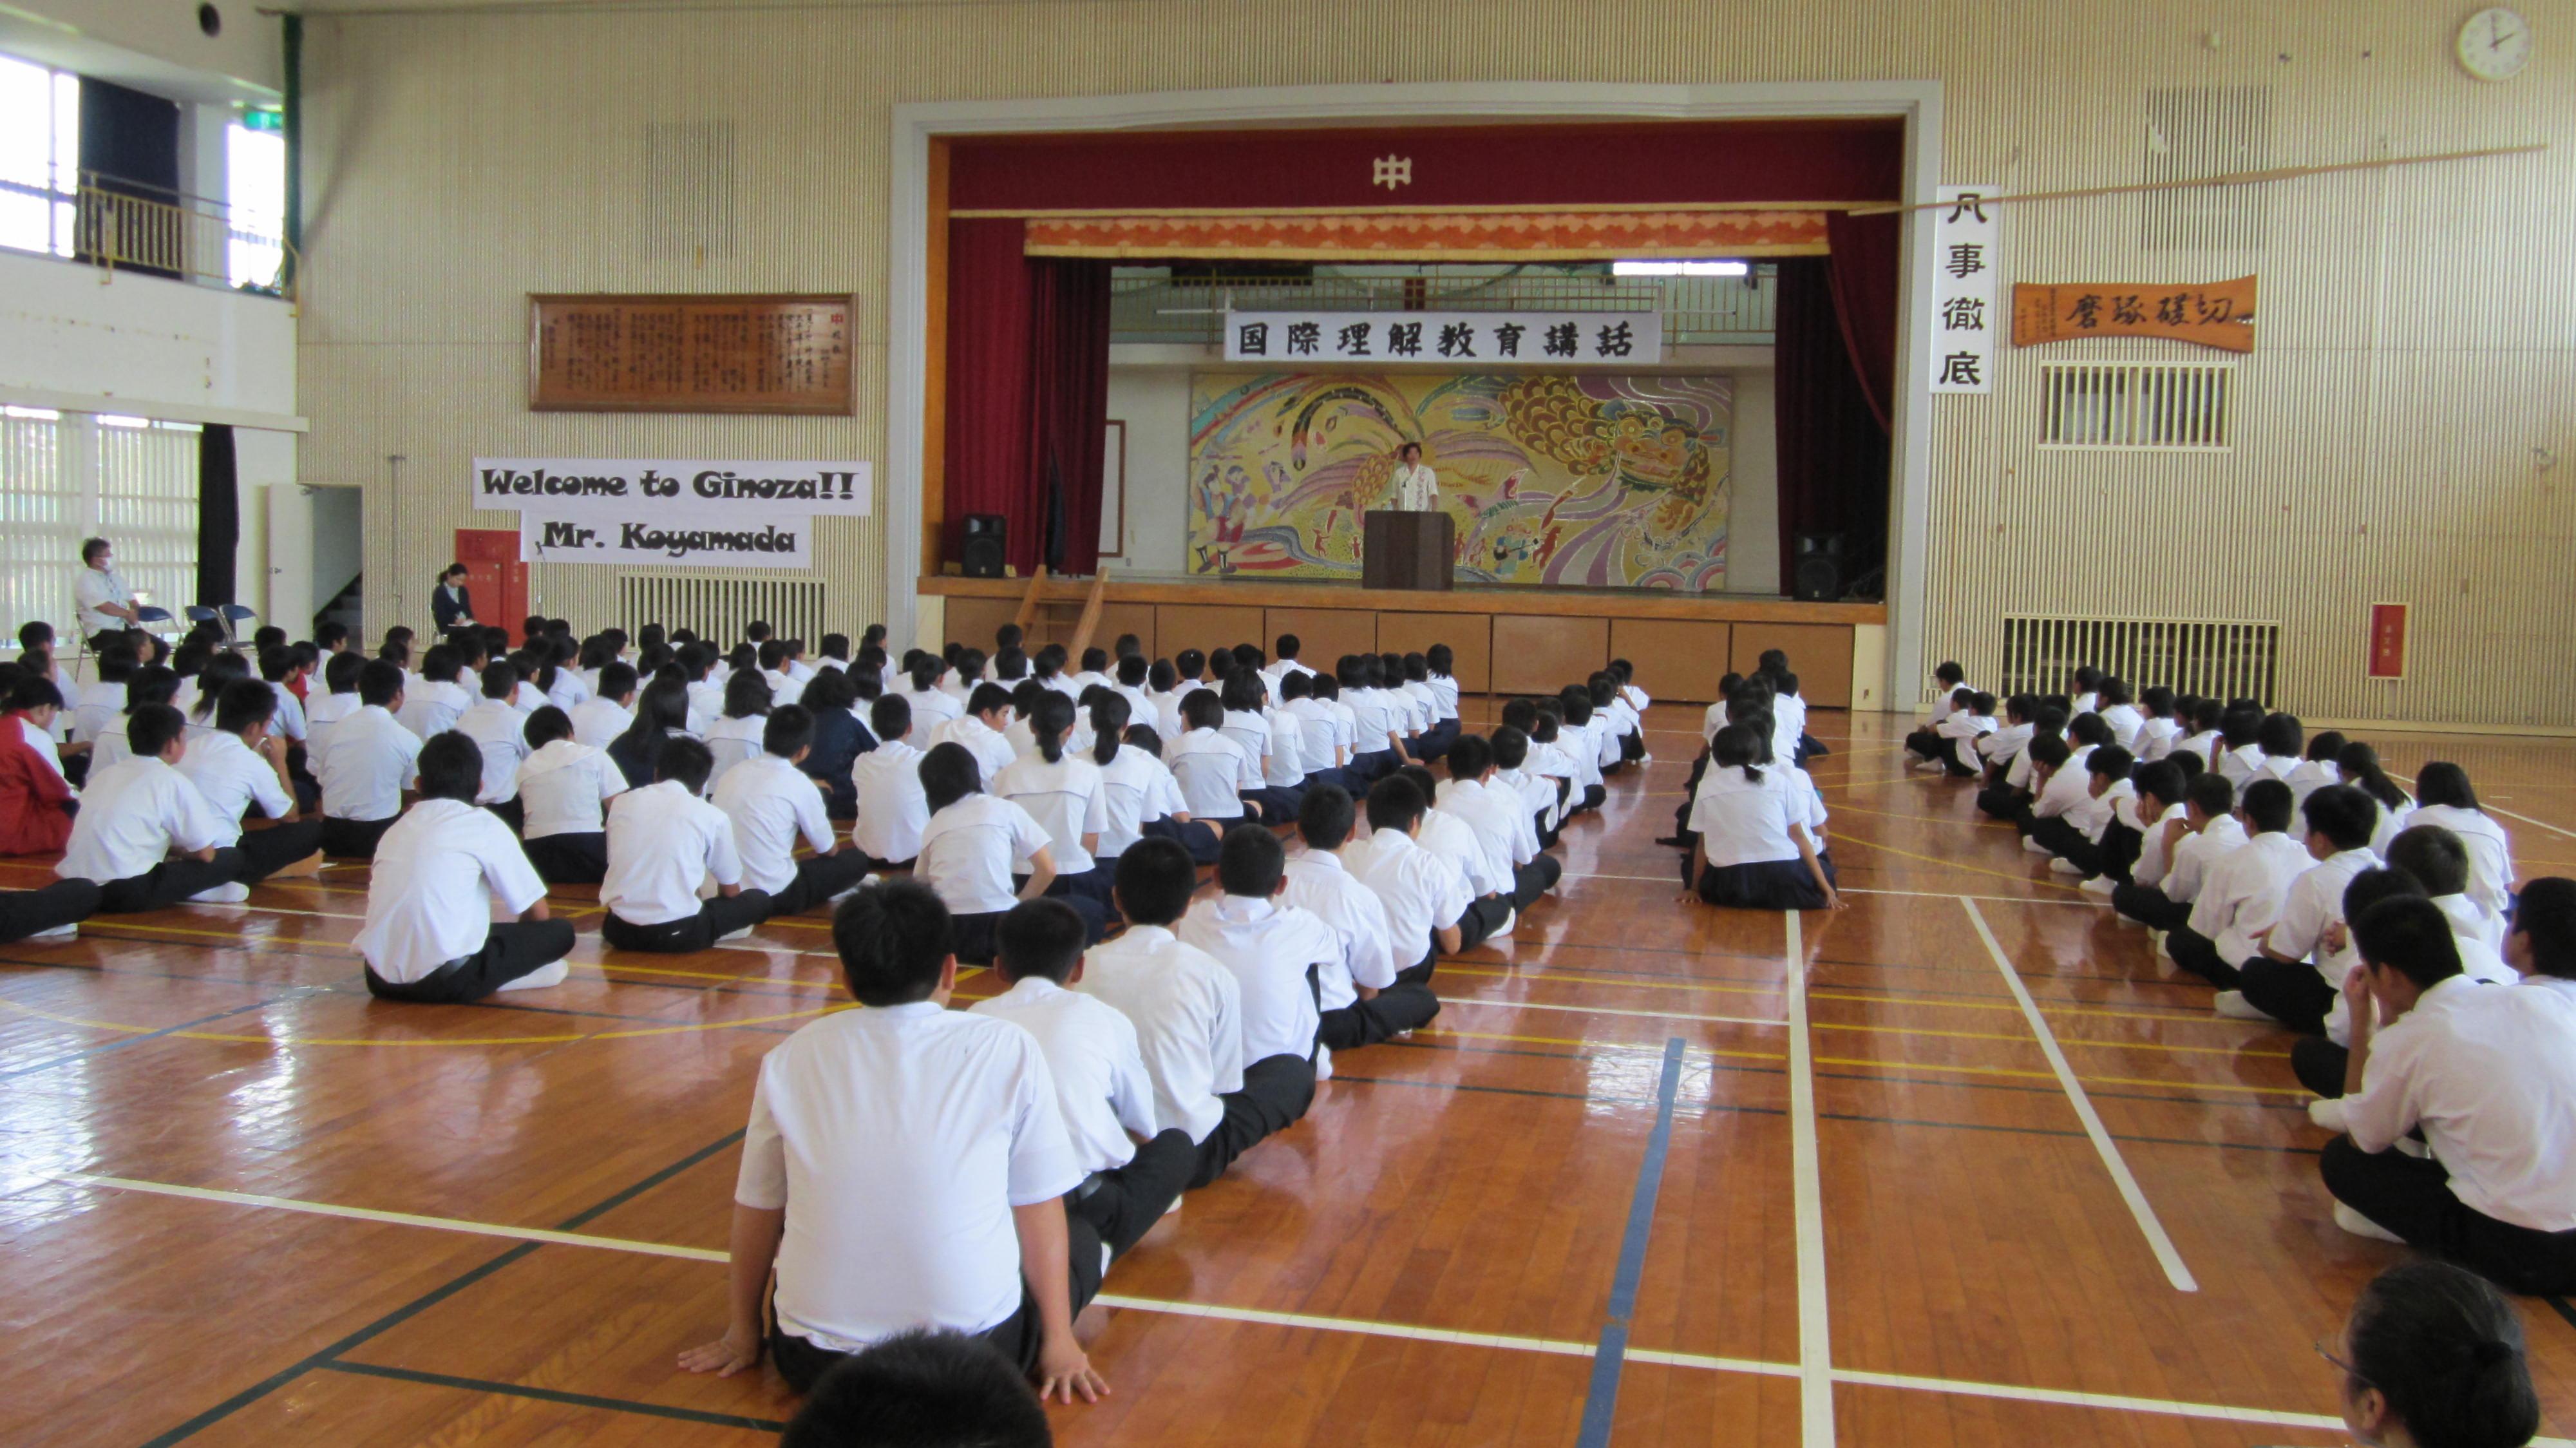 2012/9/21 Education for International Understanding